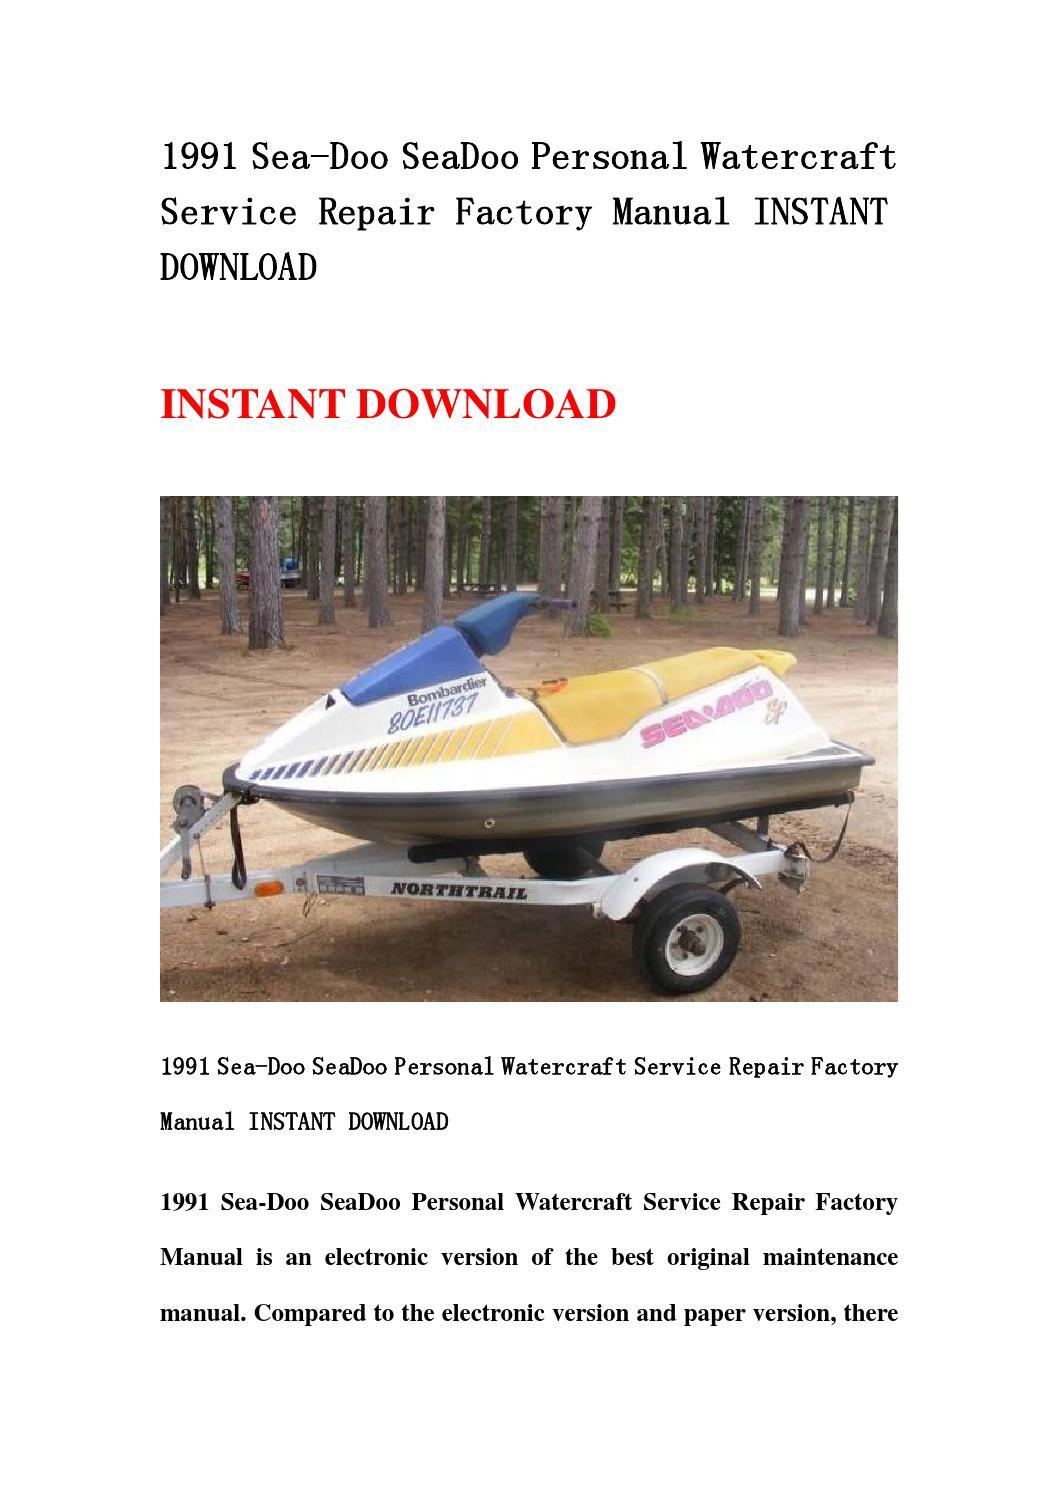 1991 Sea Doo Seadoo Personal Watercraft Service Repair